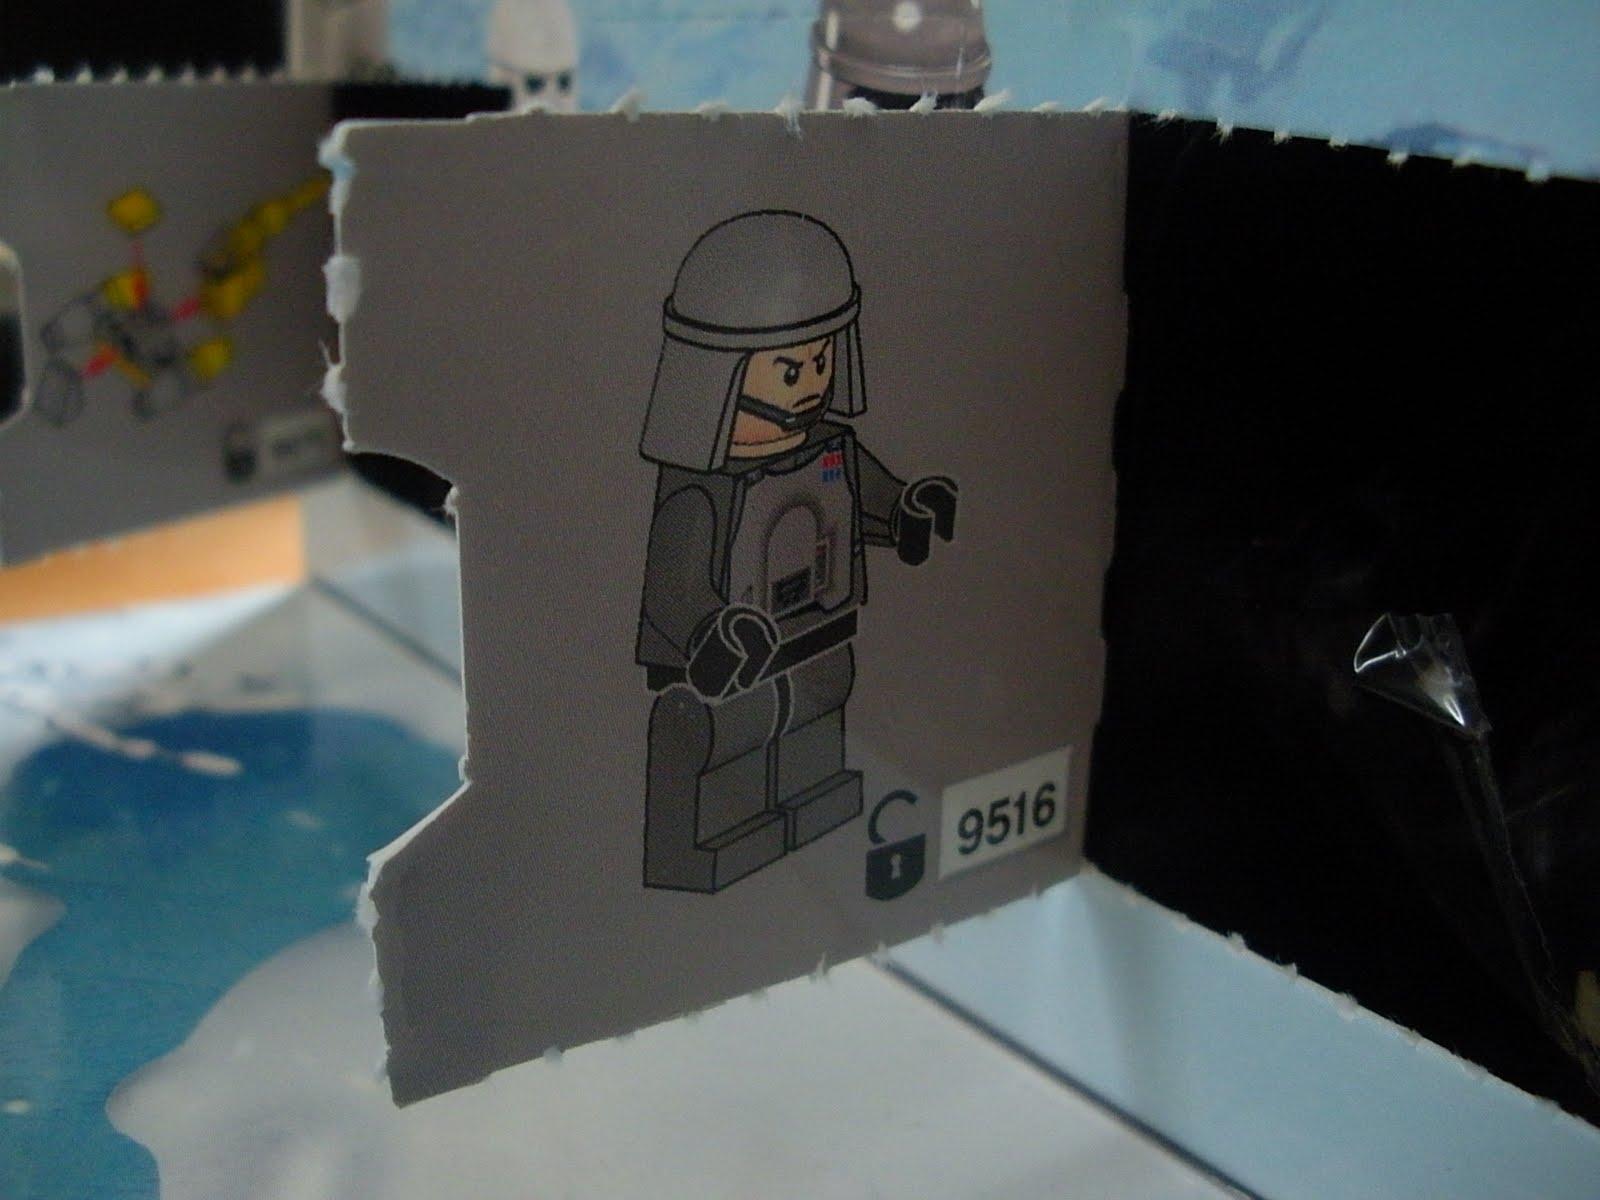 Advent Calendar 2013 Lego Star Wars Codes | Template Calendar Printable with Star Wars 2013 Advent Calendar Codes